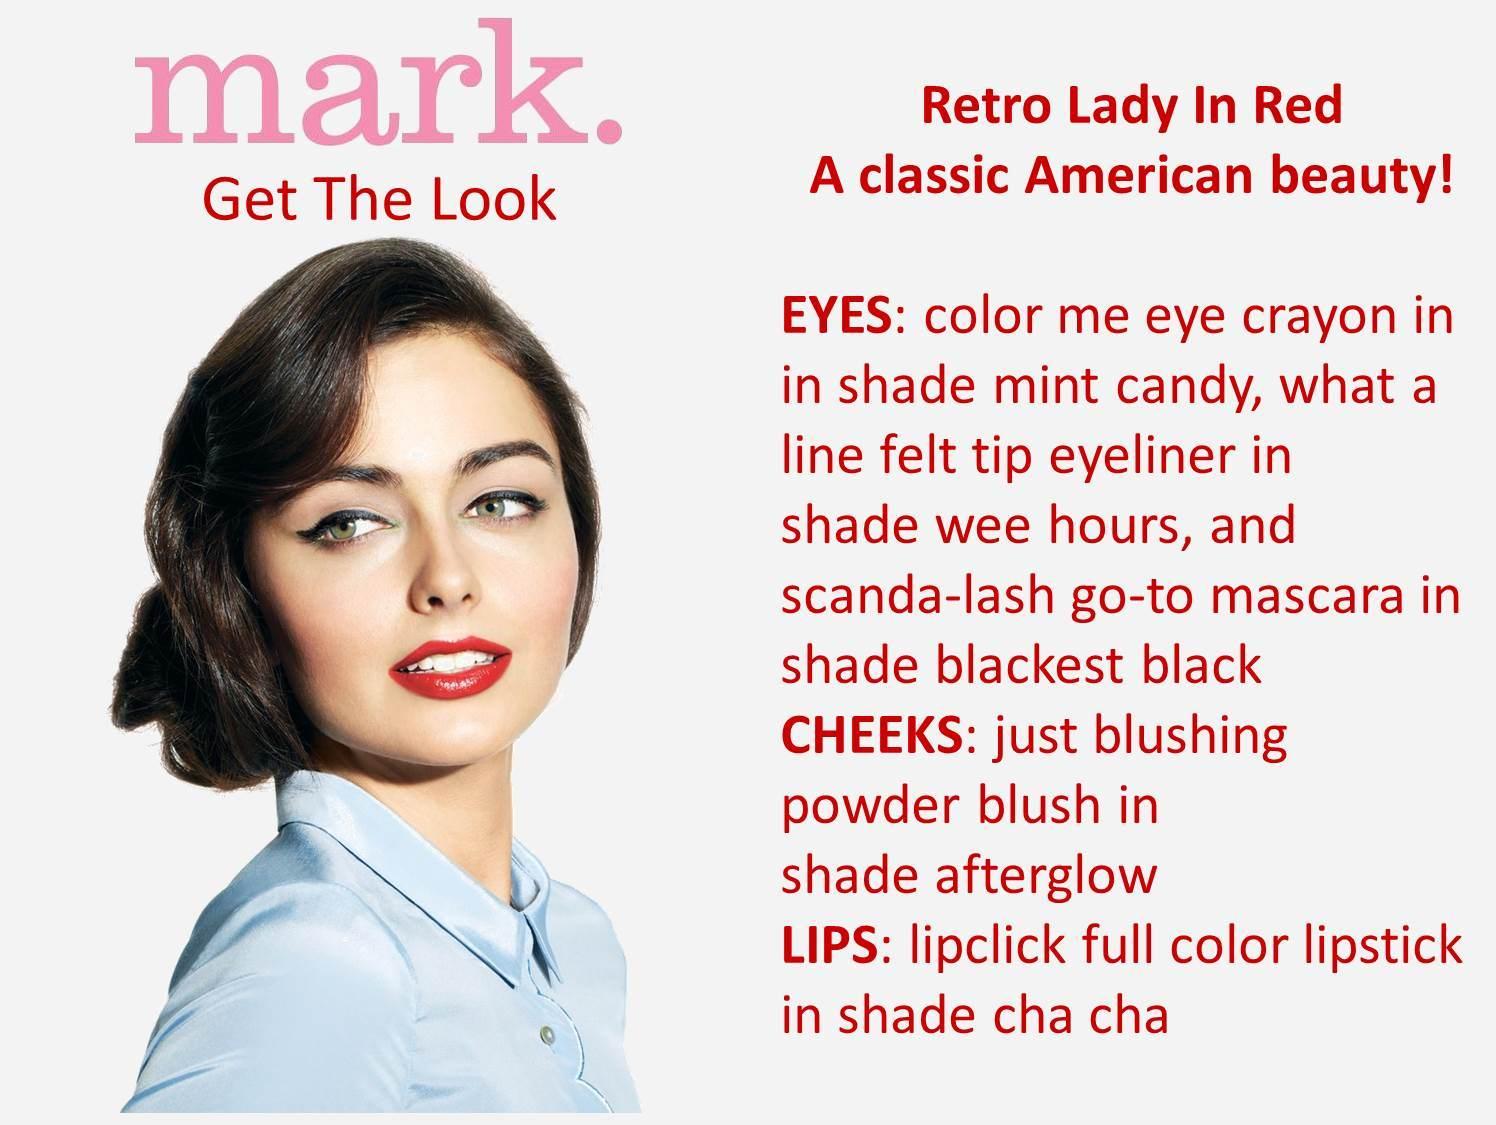 how to get a retro cinema look